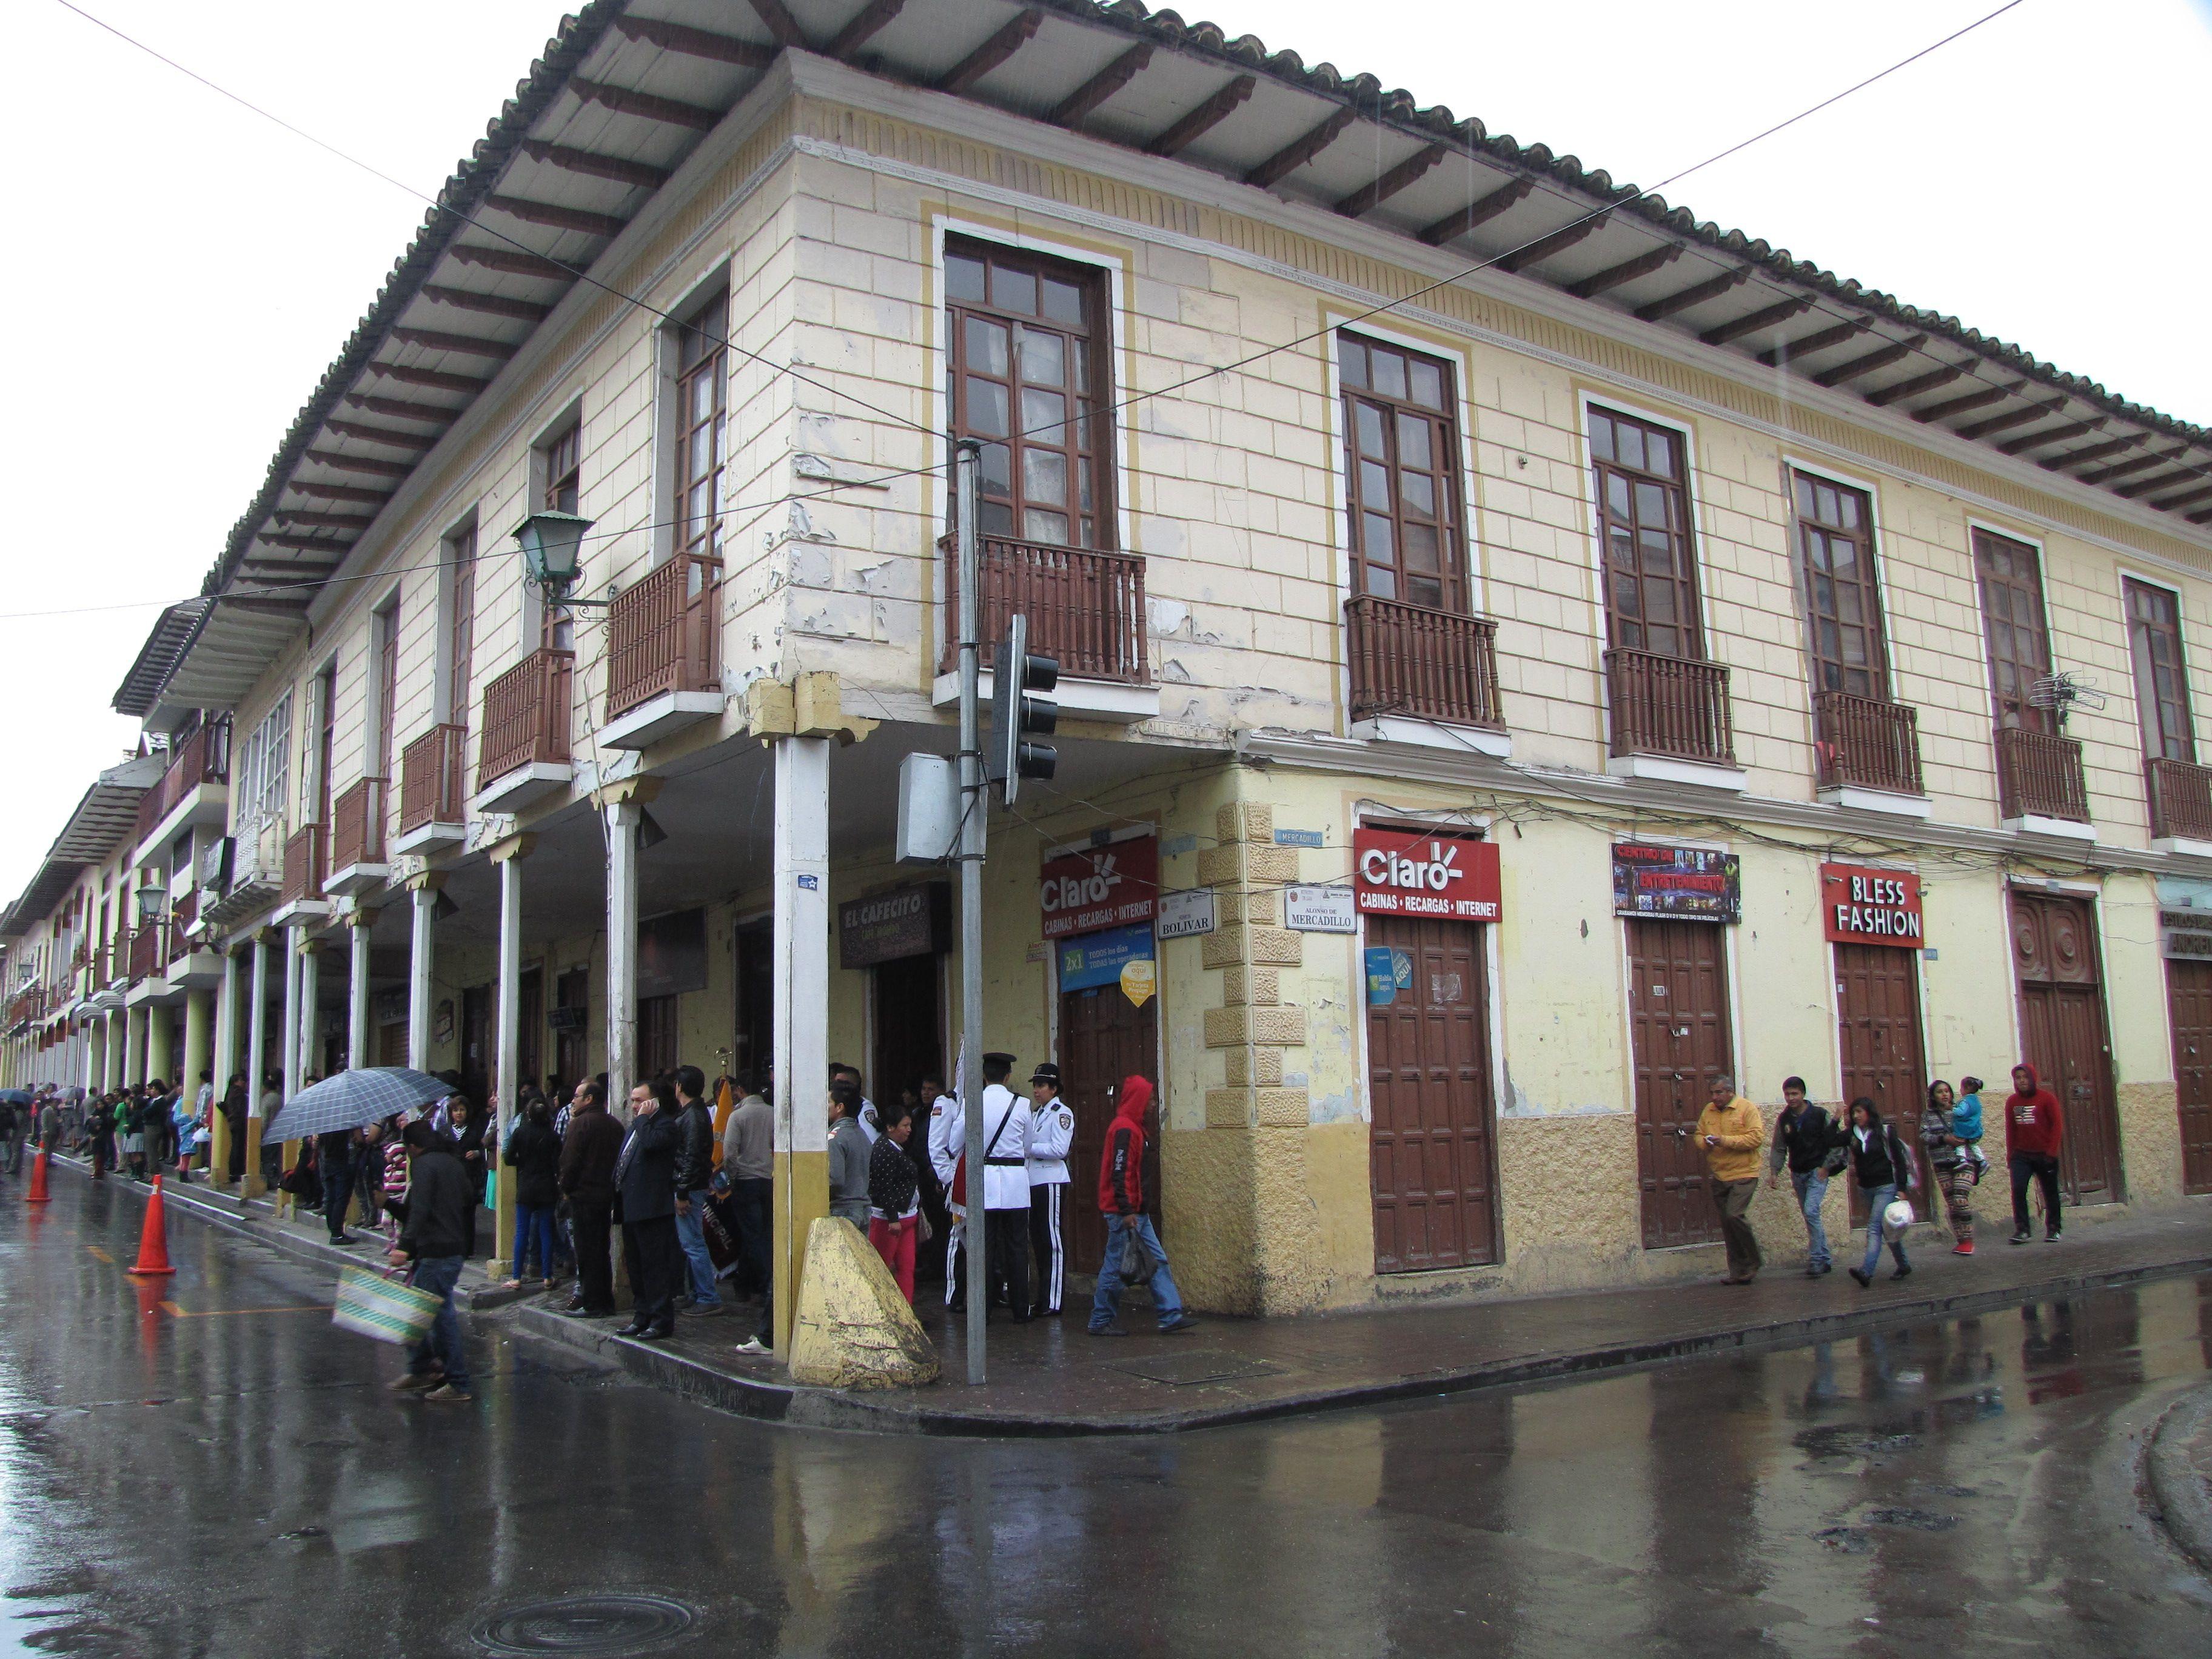 A rainy day in Loja, Ecuador